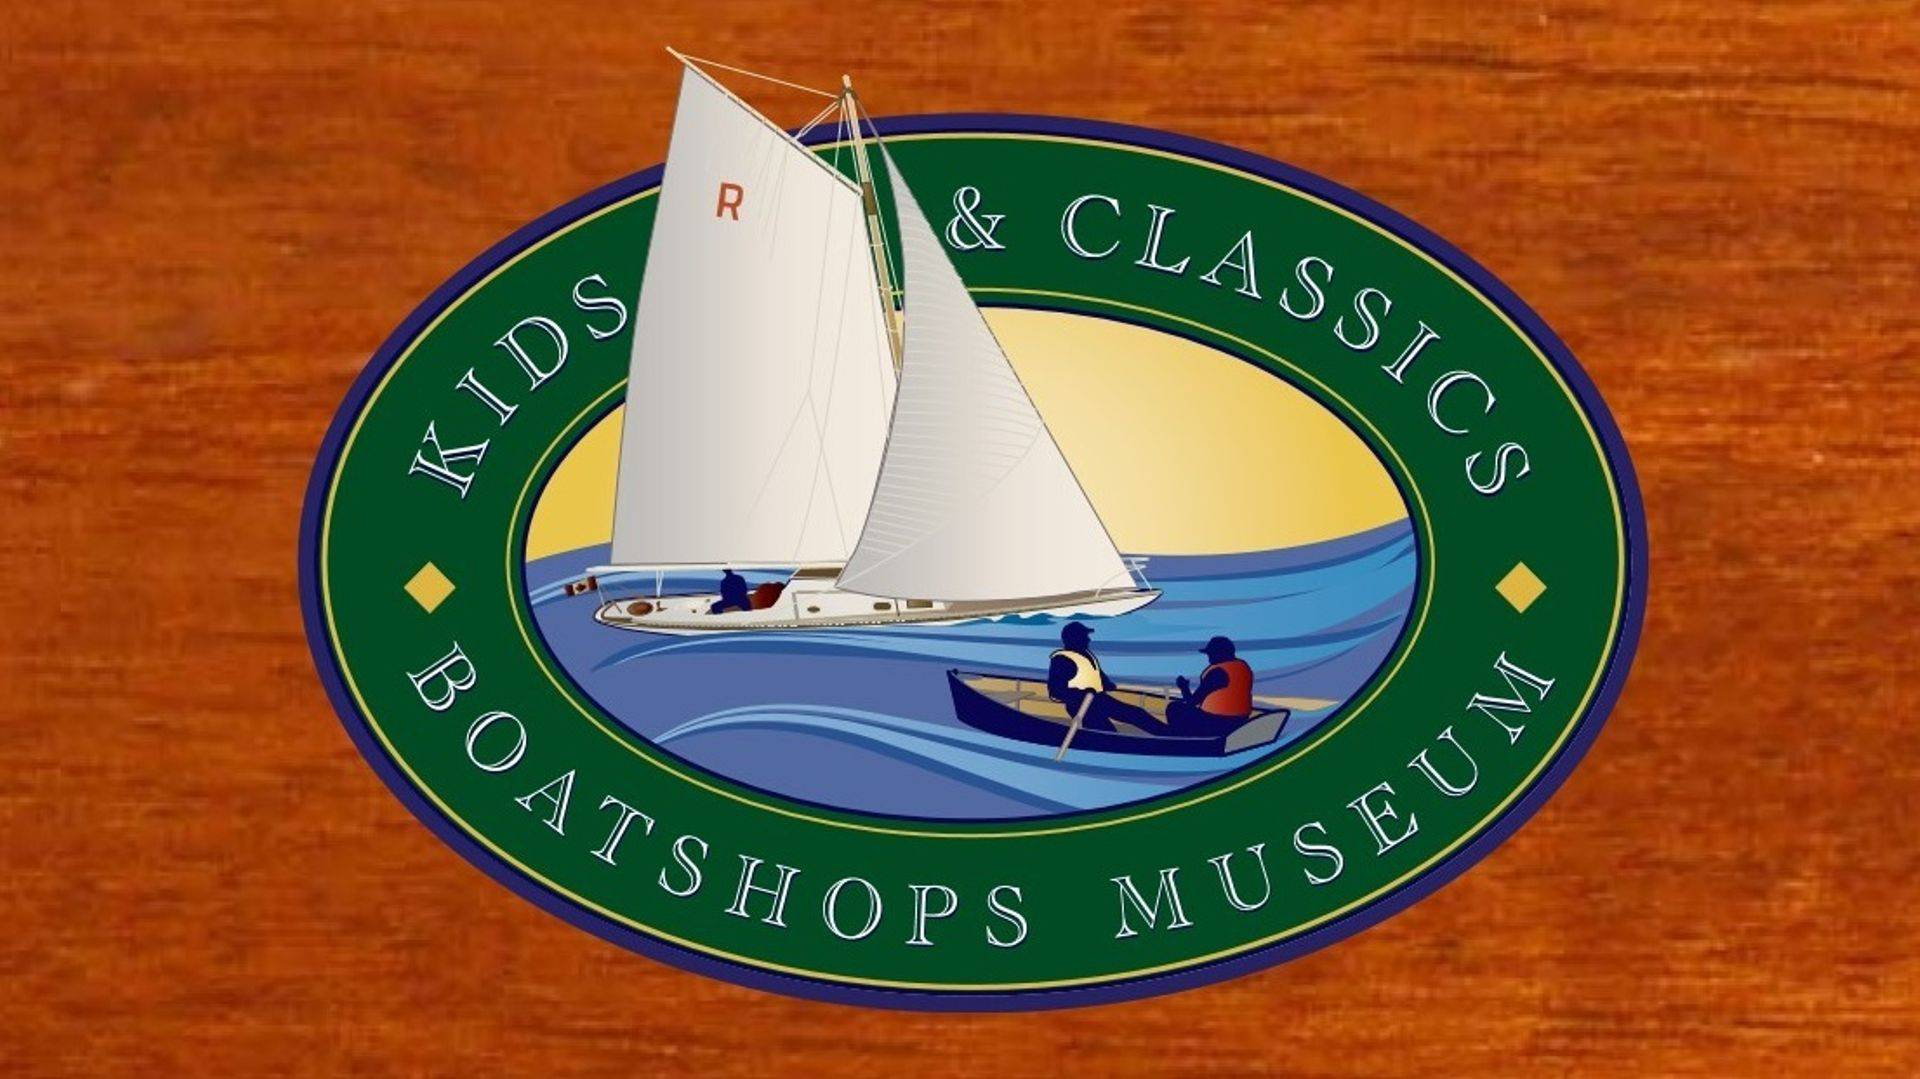 Kids & Classics Boat Museum